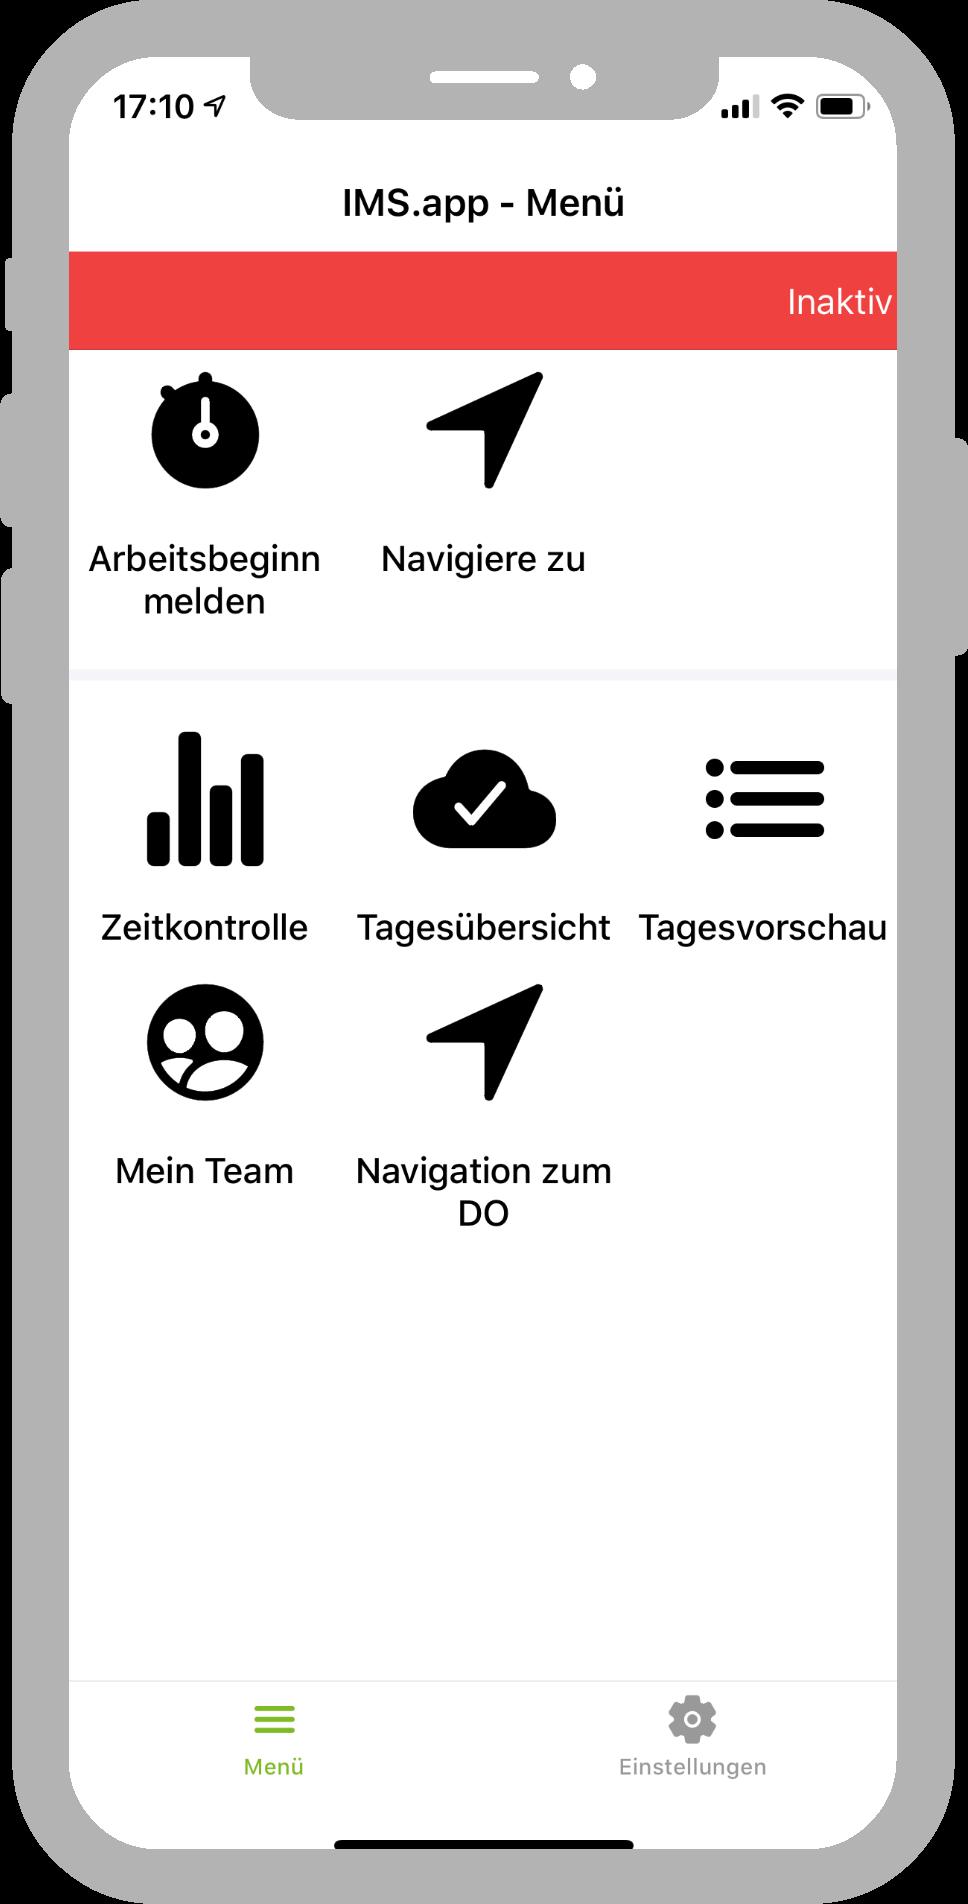 IMS.app Menü Arbeitsbeginn melden